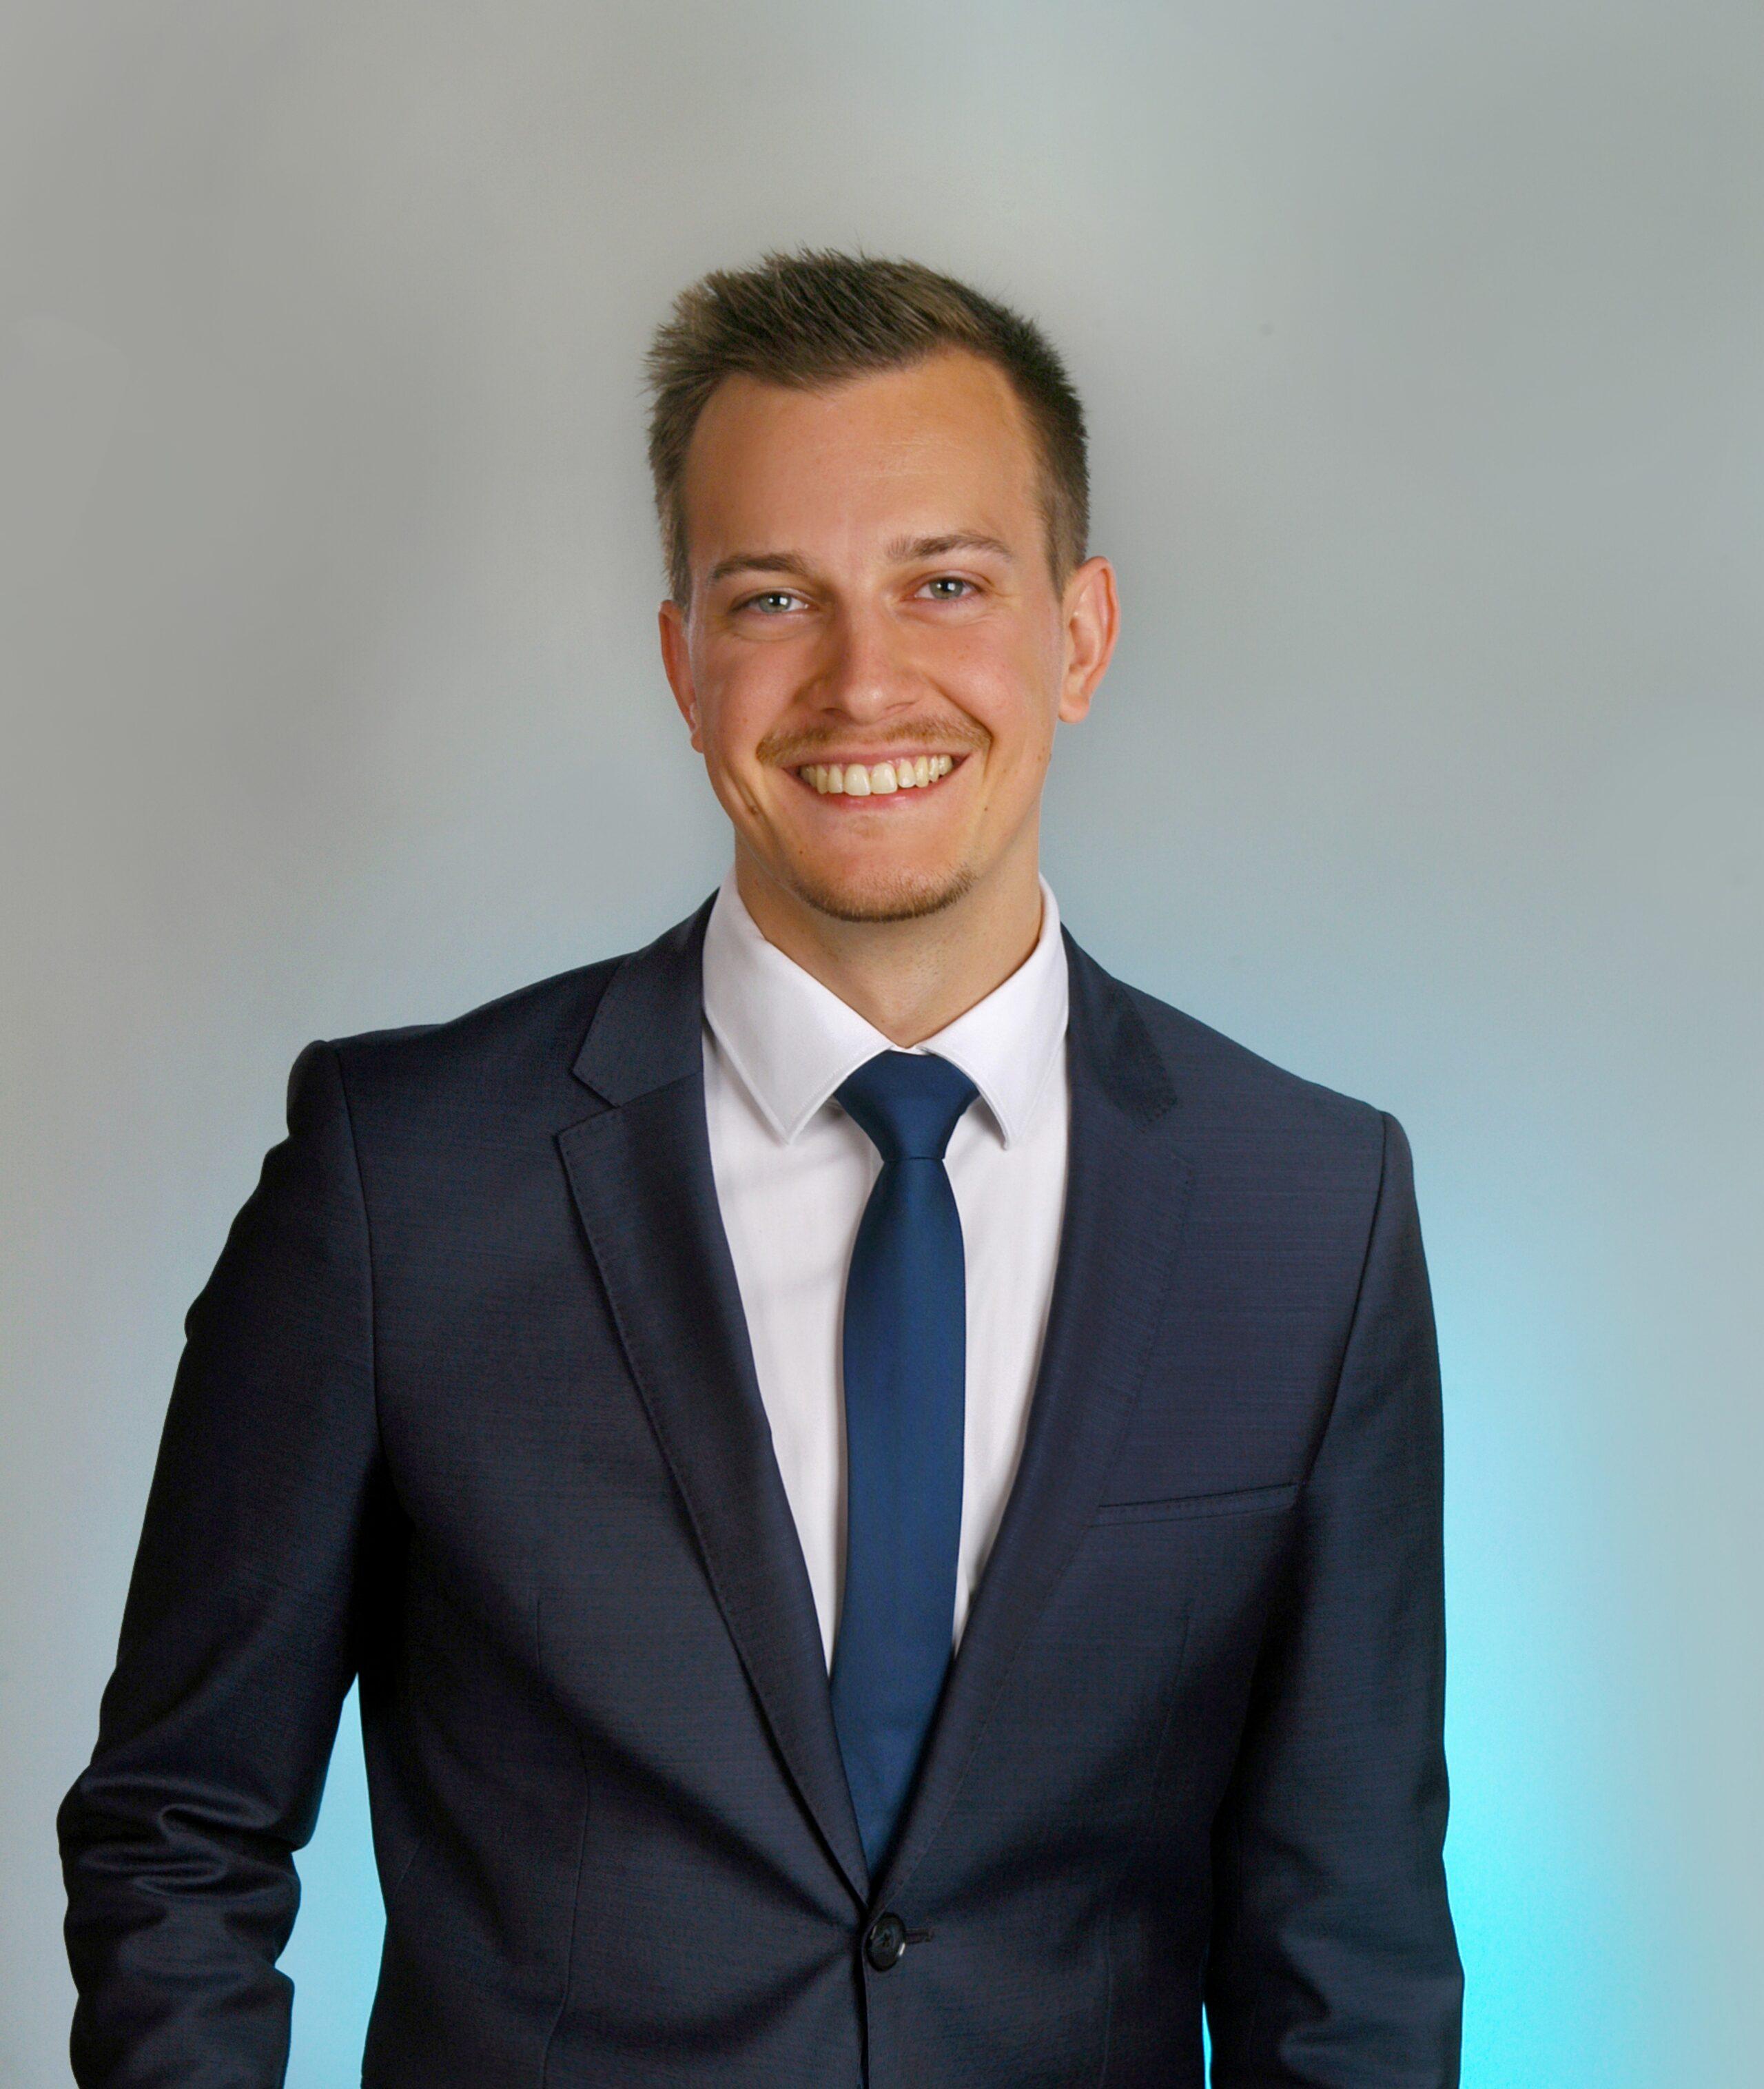 Patrick Hübner | Jeder kann verändern